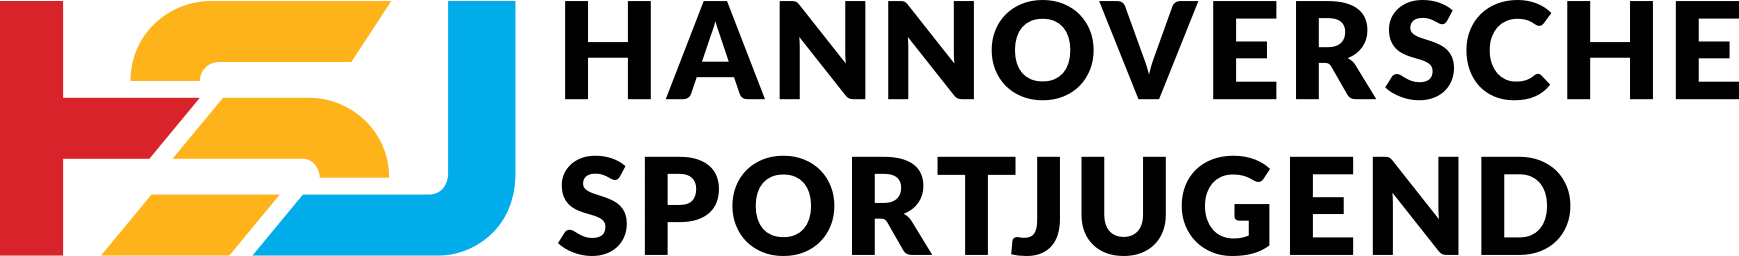 hannoversche sportjugend logo